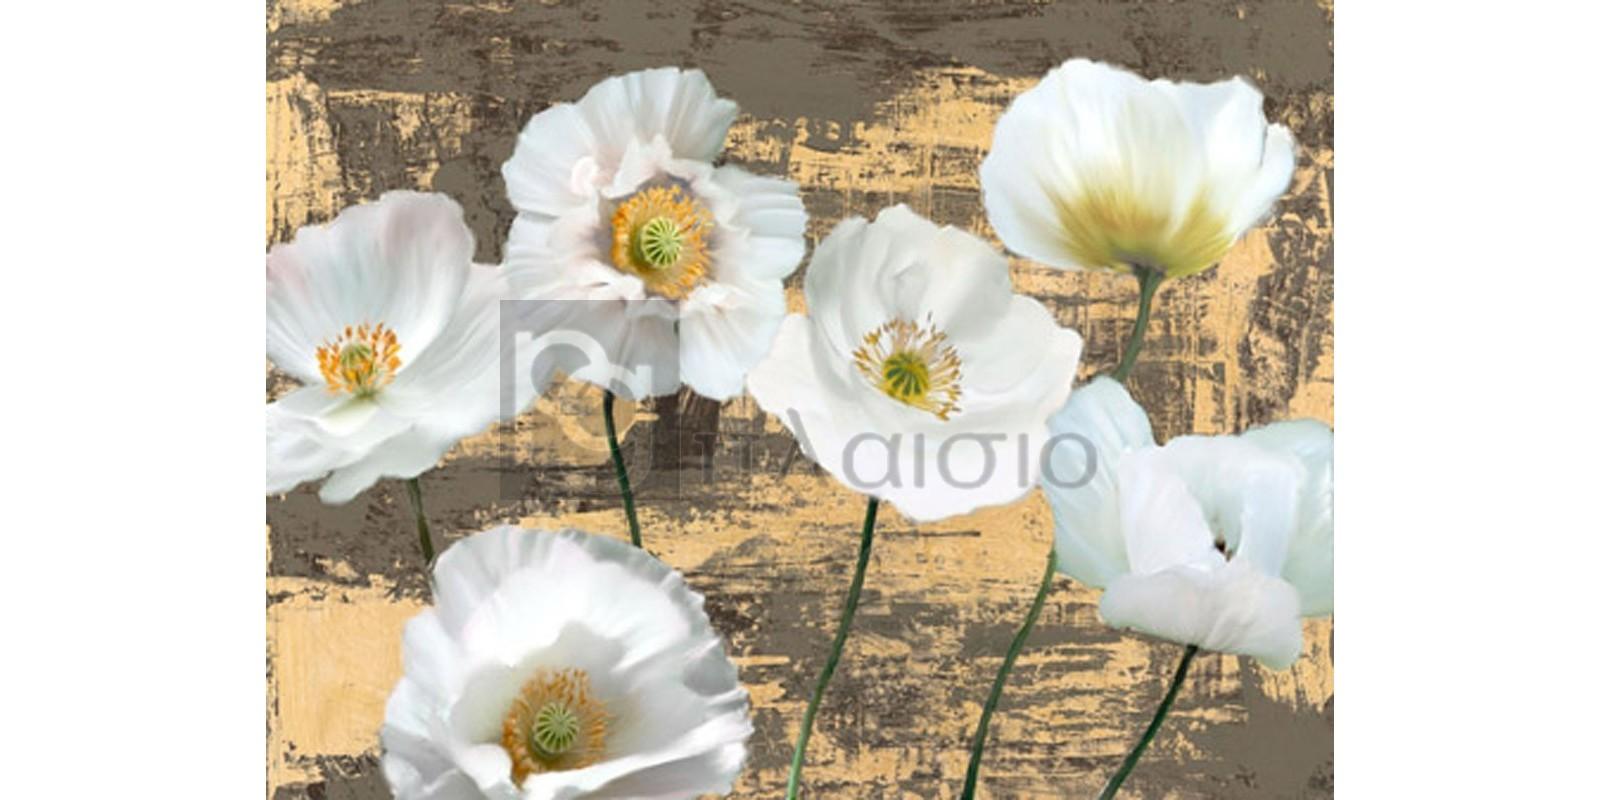 LEONARDO SANNA - Washed Poppies (Ash & Gold)